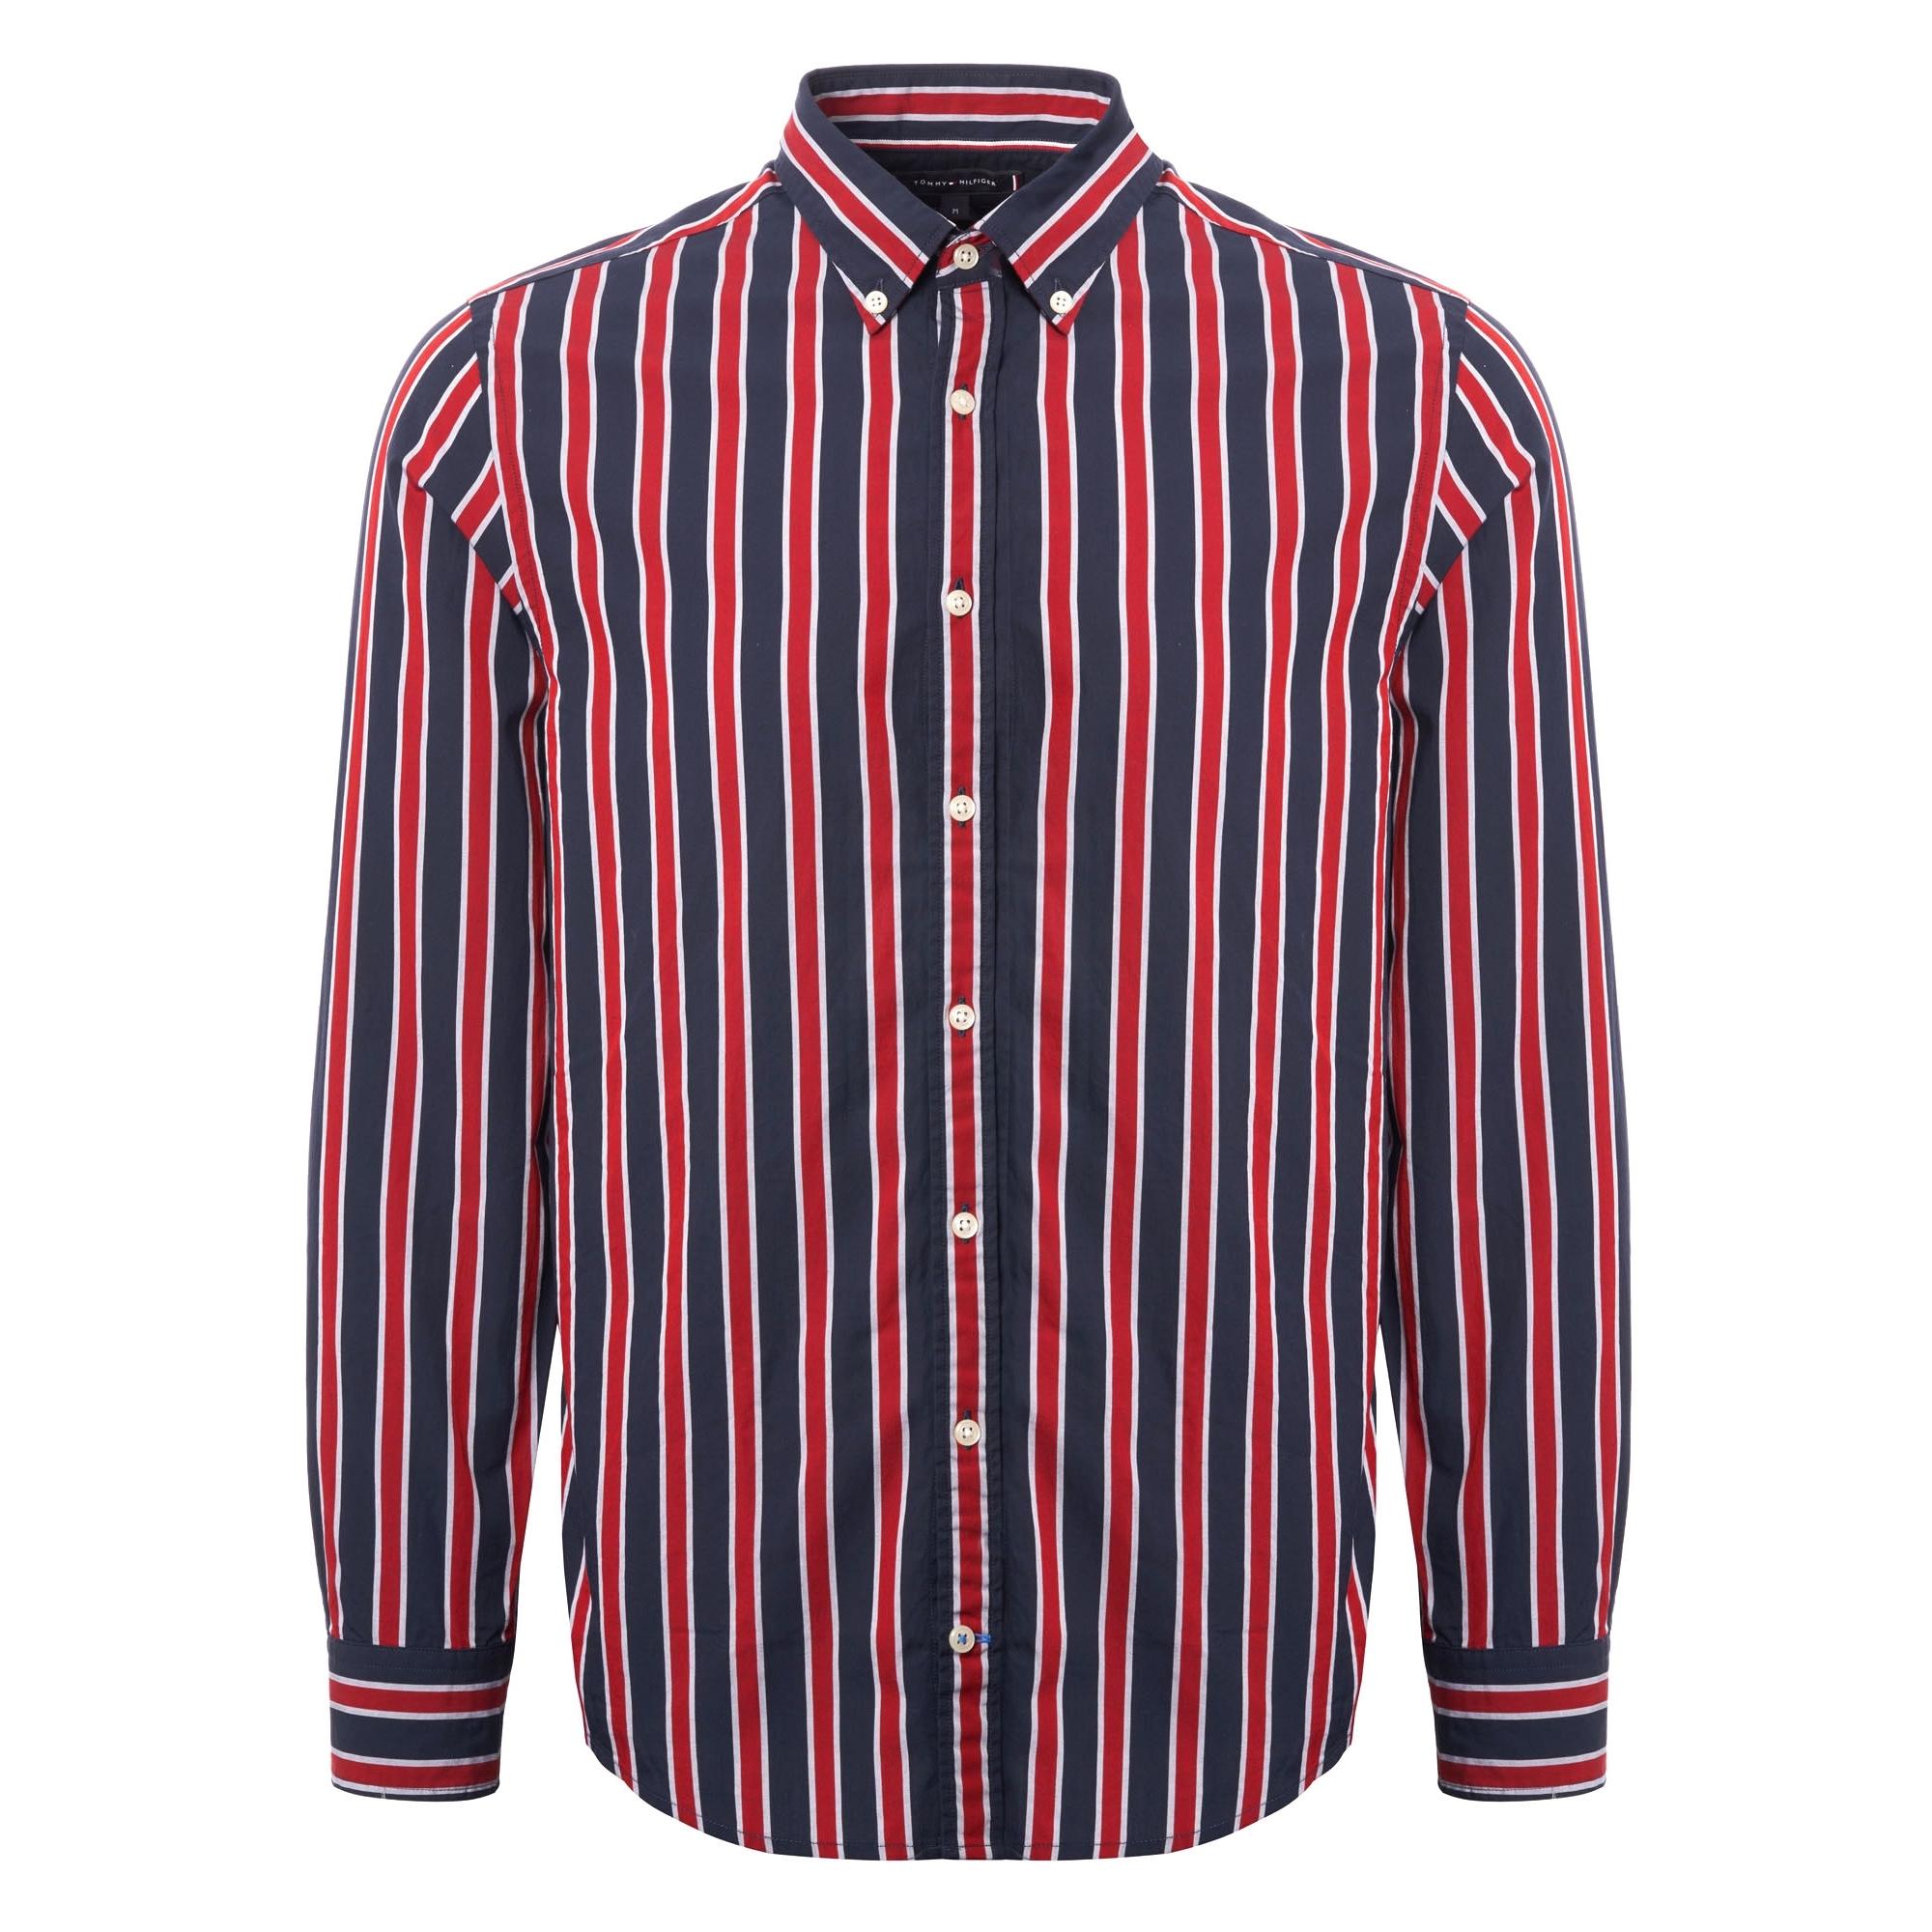 abd67793 Tommy Hilfiger Regimental Stripe Shirt | Red & Black | MW0MW07792